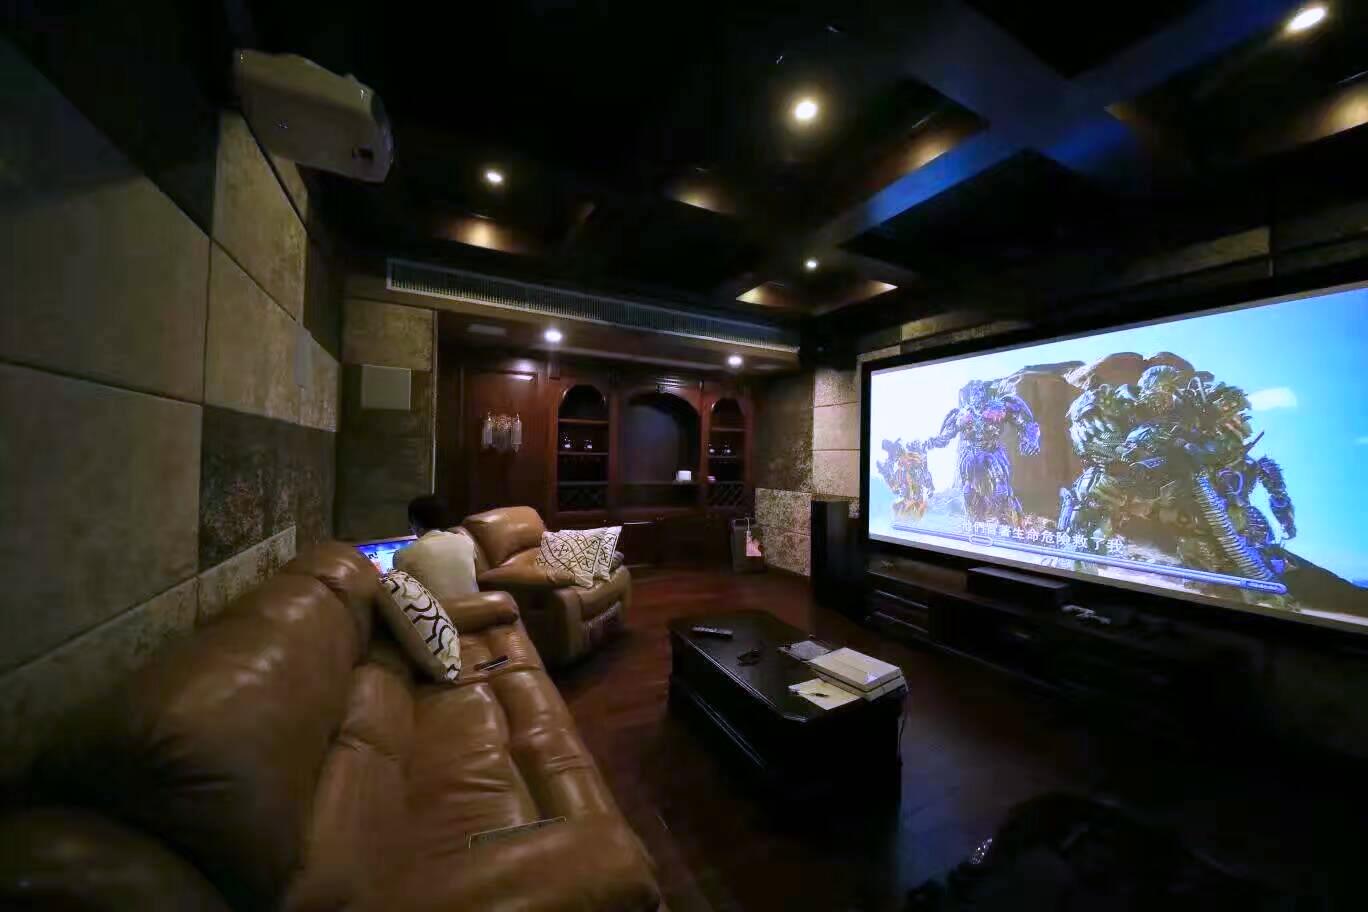 valentines day date ideas (4) - private cinema muveespace